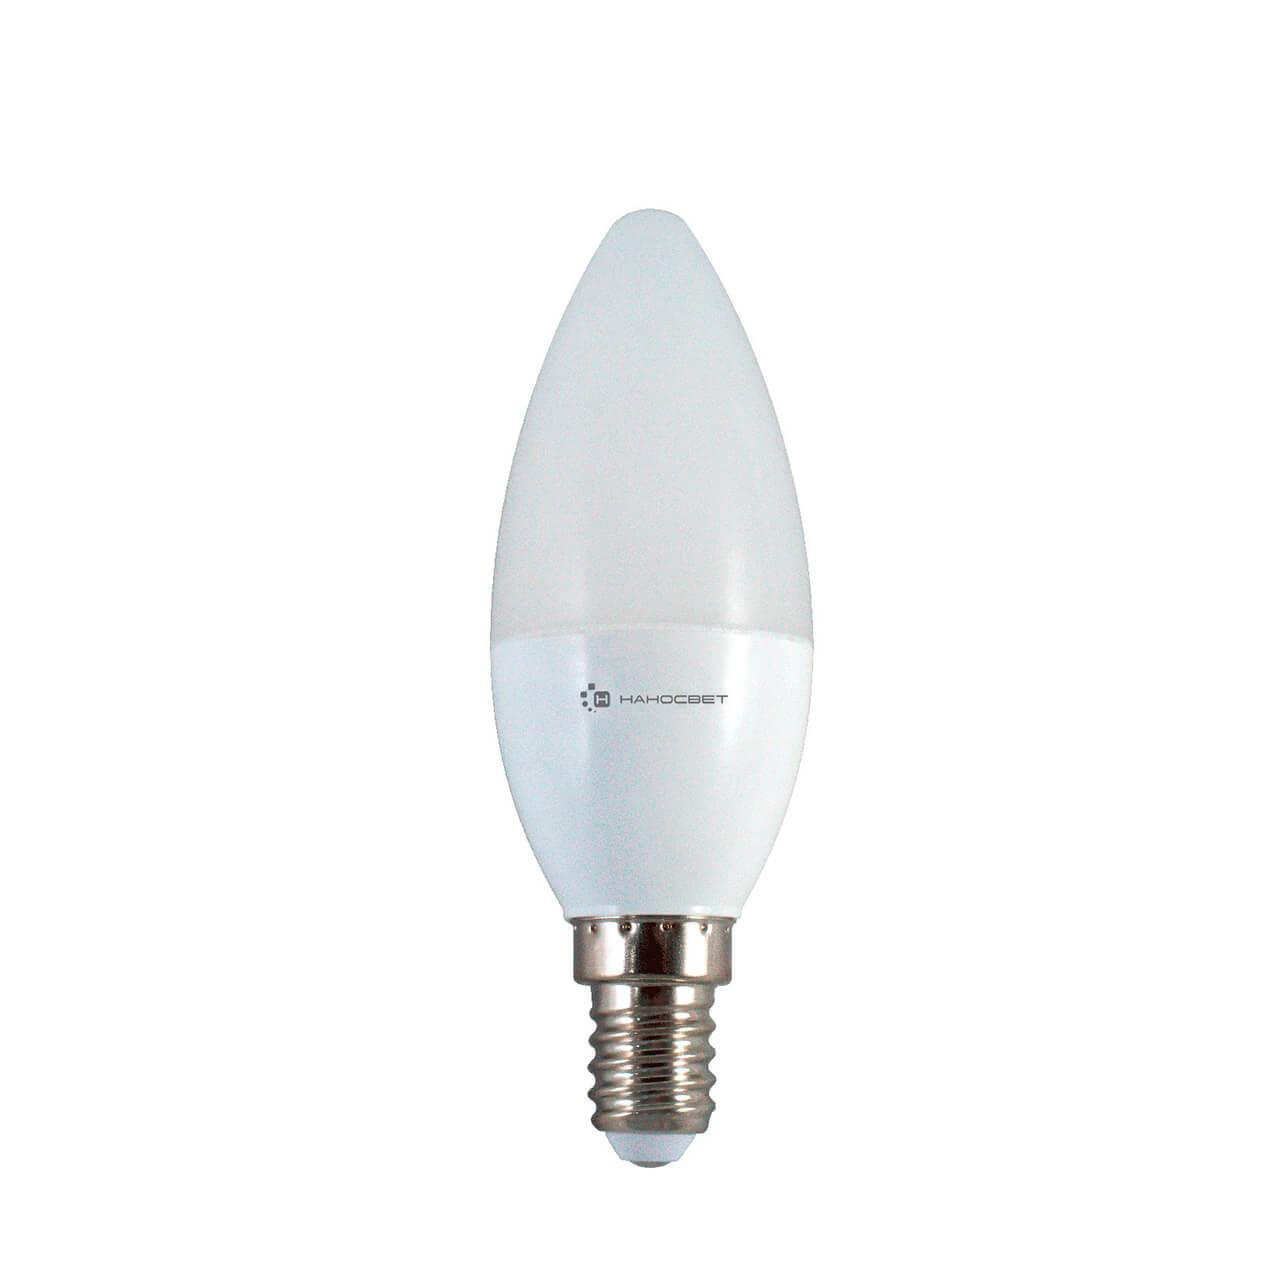 Лампа светодиодная Наносвет E14 6W 2700K матовая LE-CD-6/E14/827 L250 лампа светодиодная e27 6w 2700k свеча матовая le cd 6 e27 827 l252